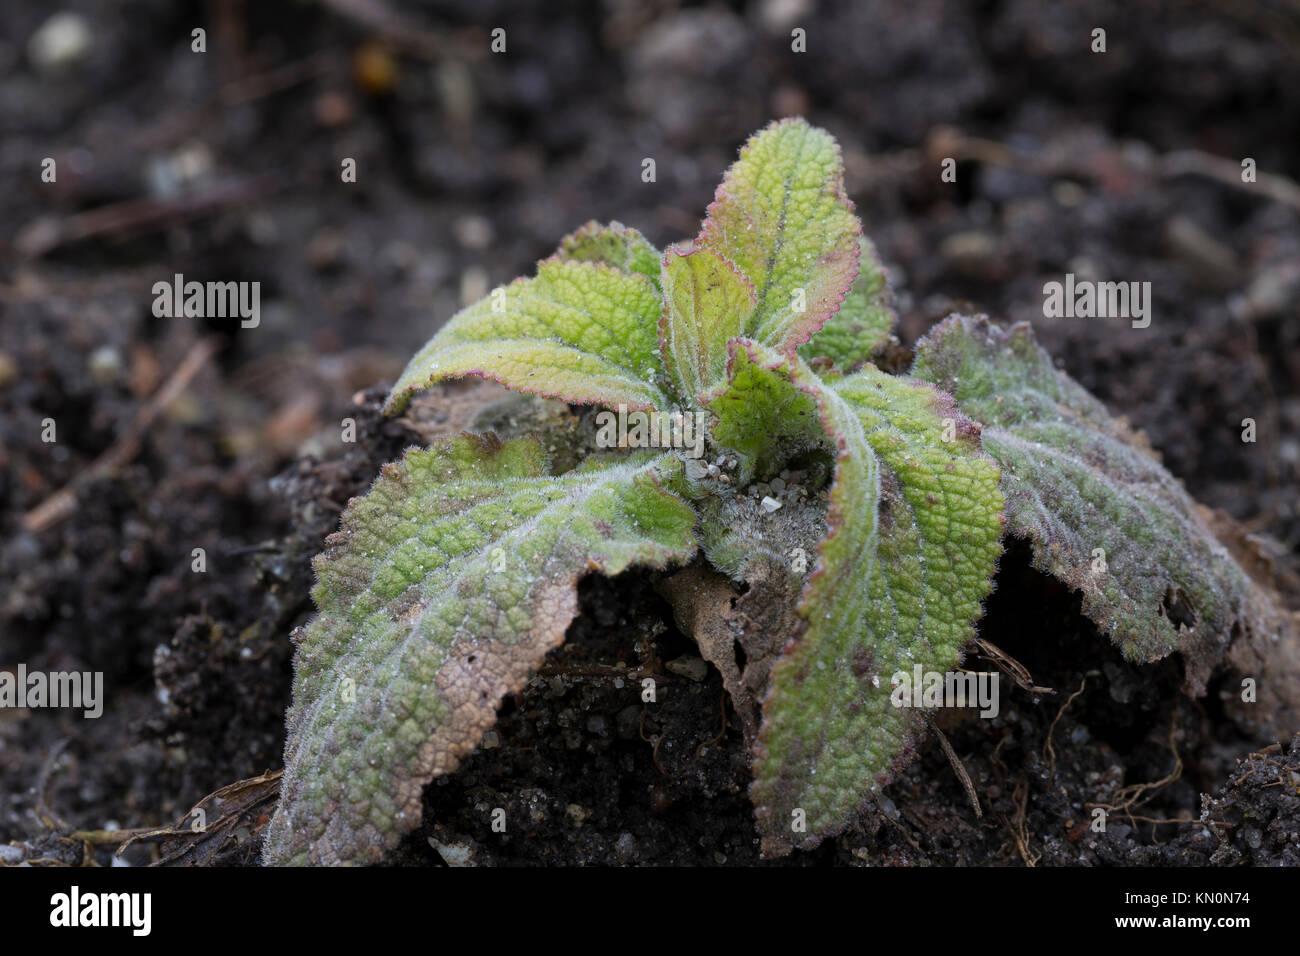 Roter Fingerhut, Blatt, Blätter, Blattrosette, Digitalis purpurea, Foxglove, Fox-guanto Immagini Stock